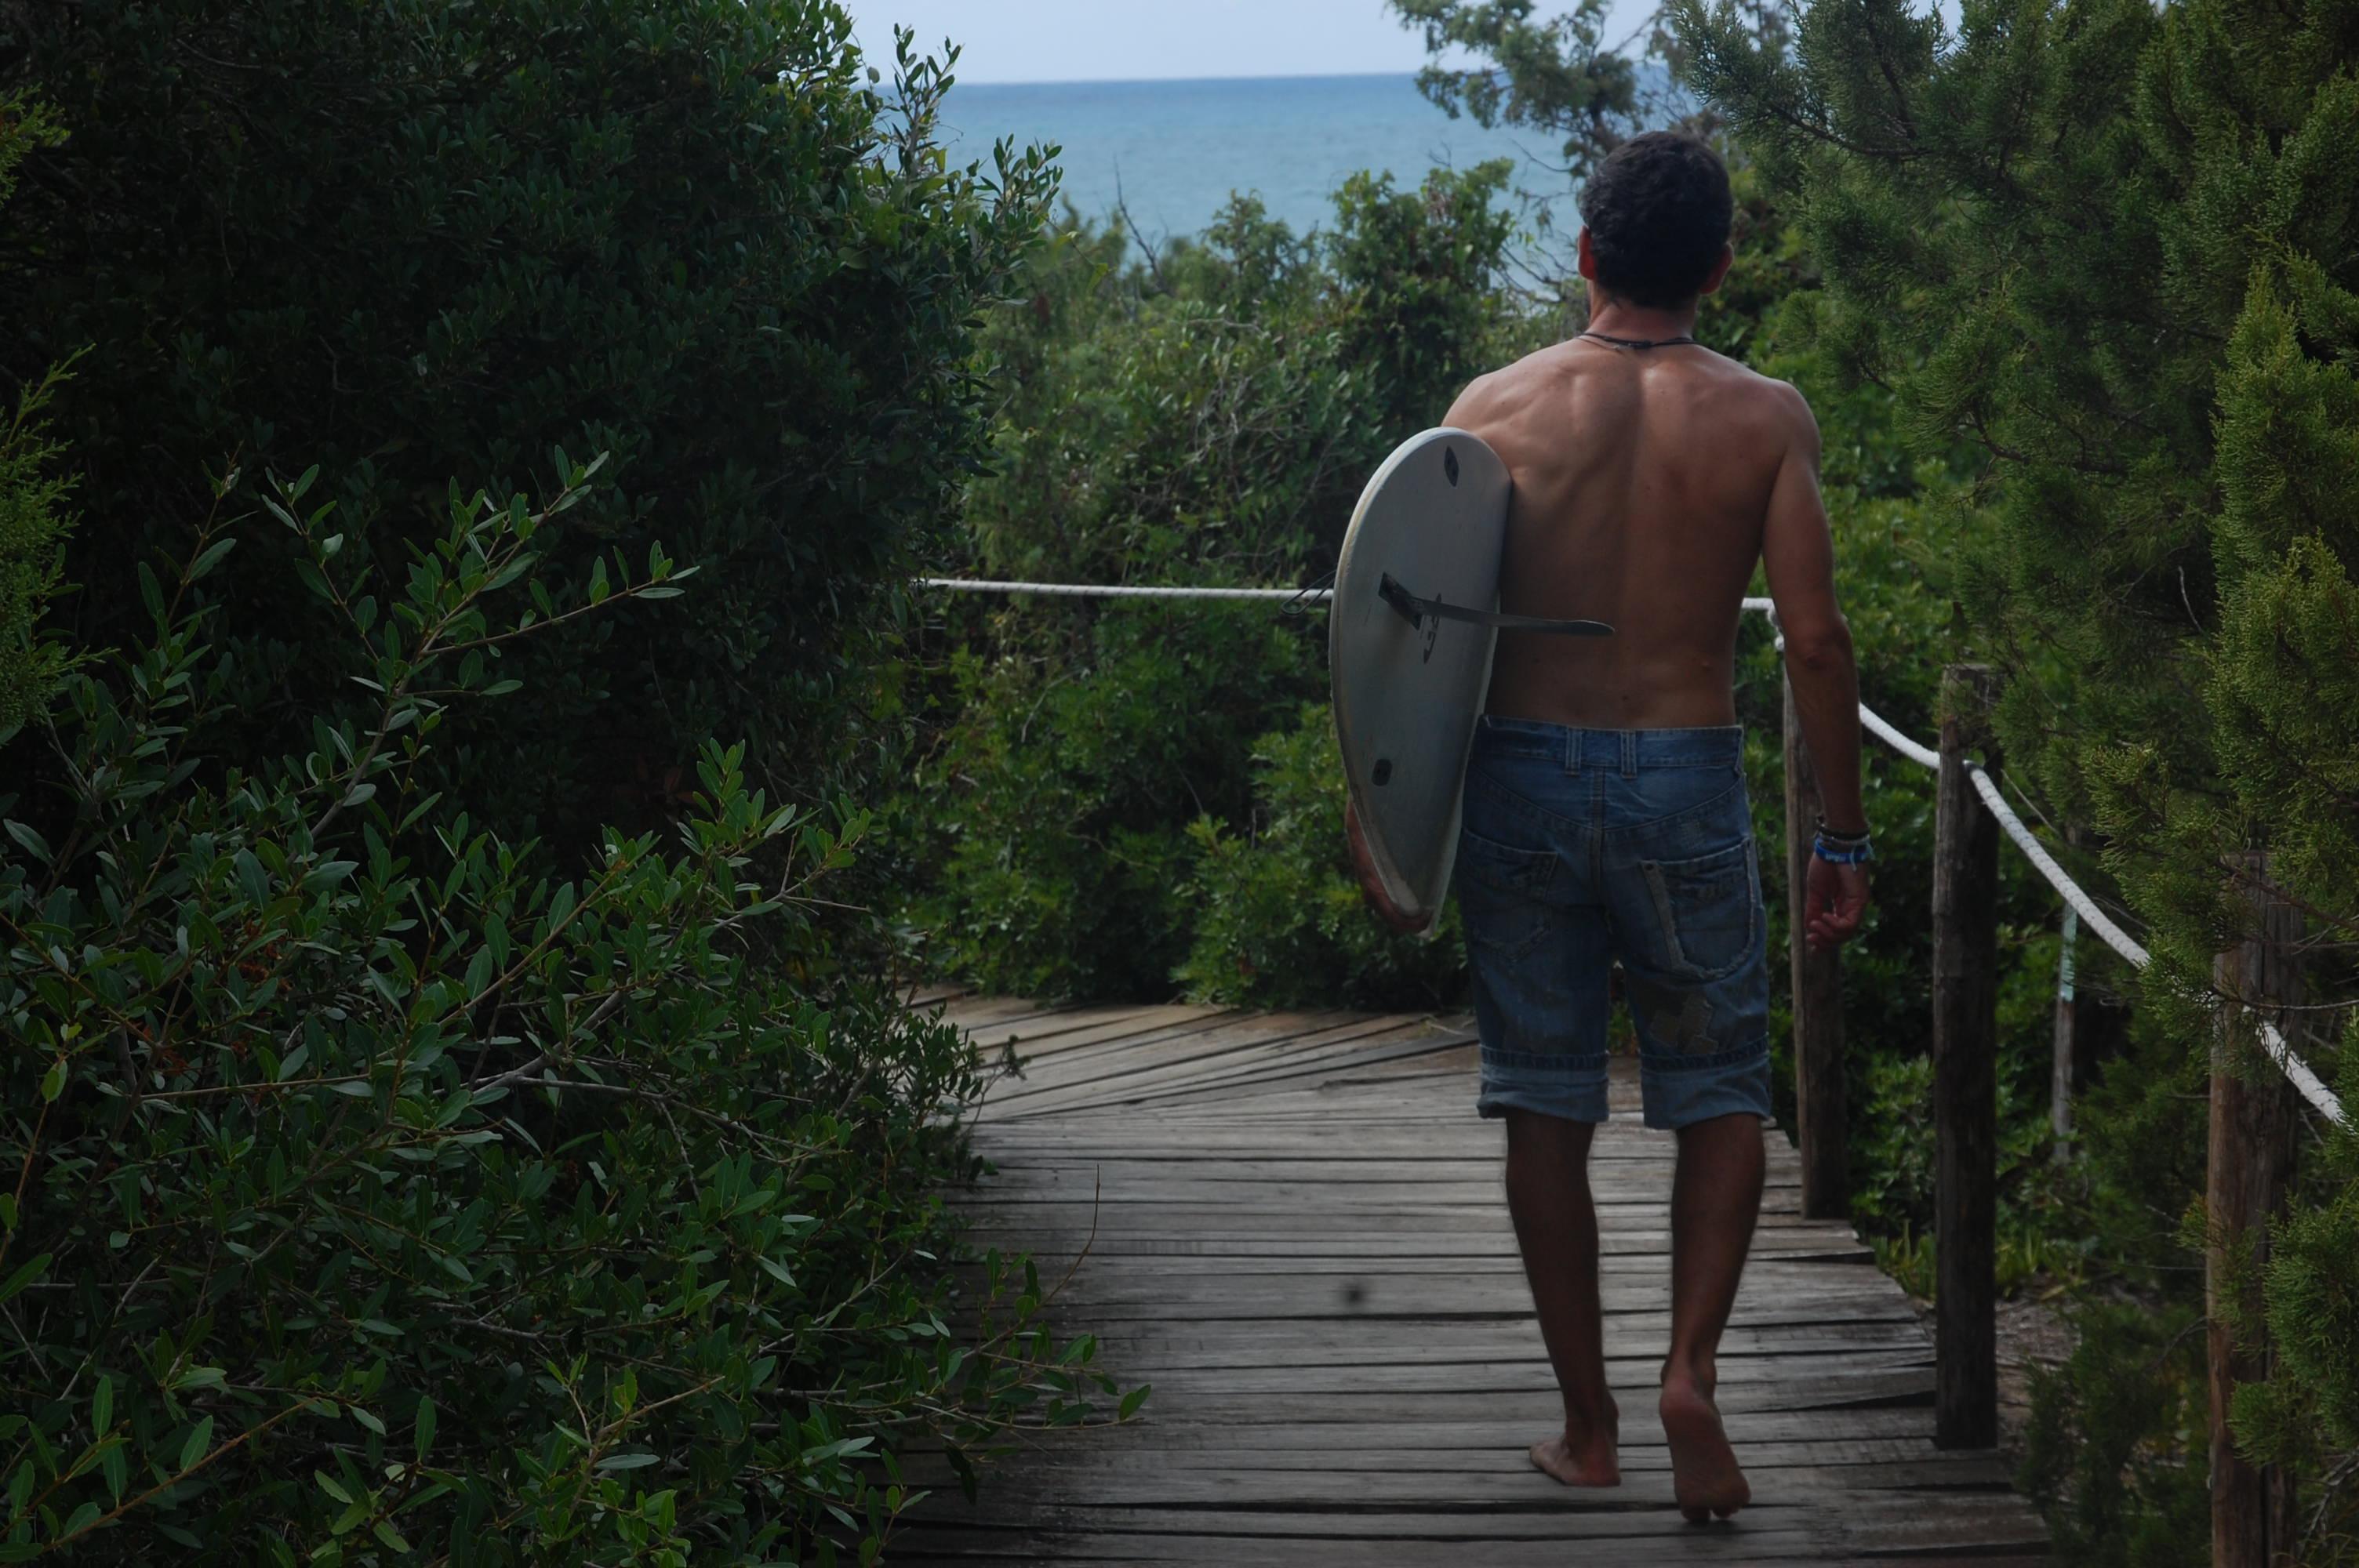 Luca Diodato e tavola da surf